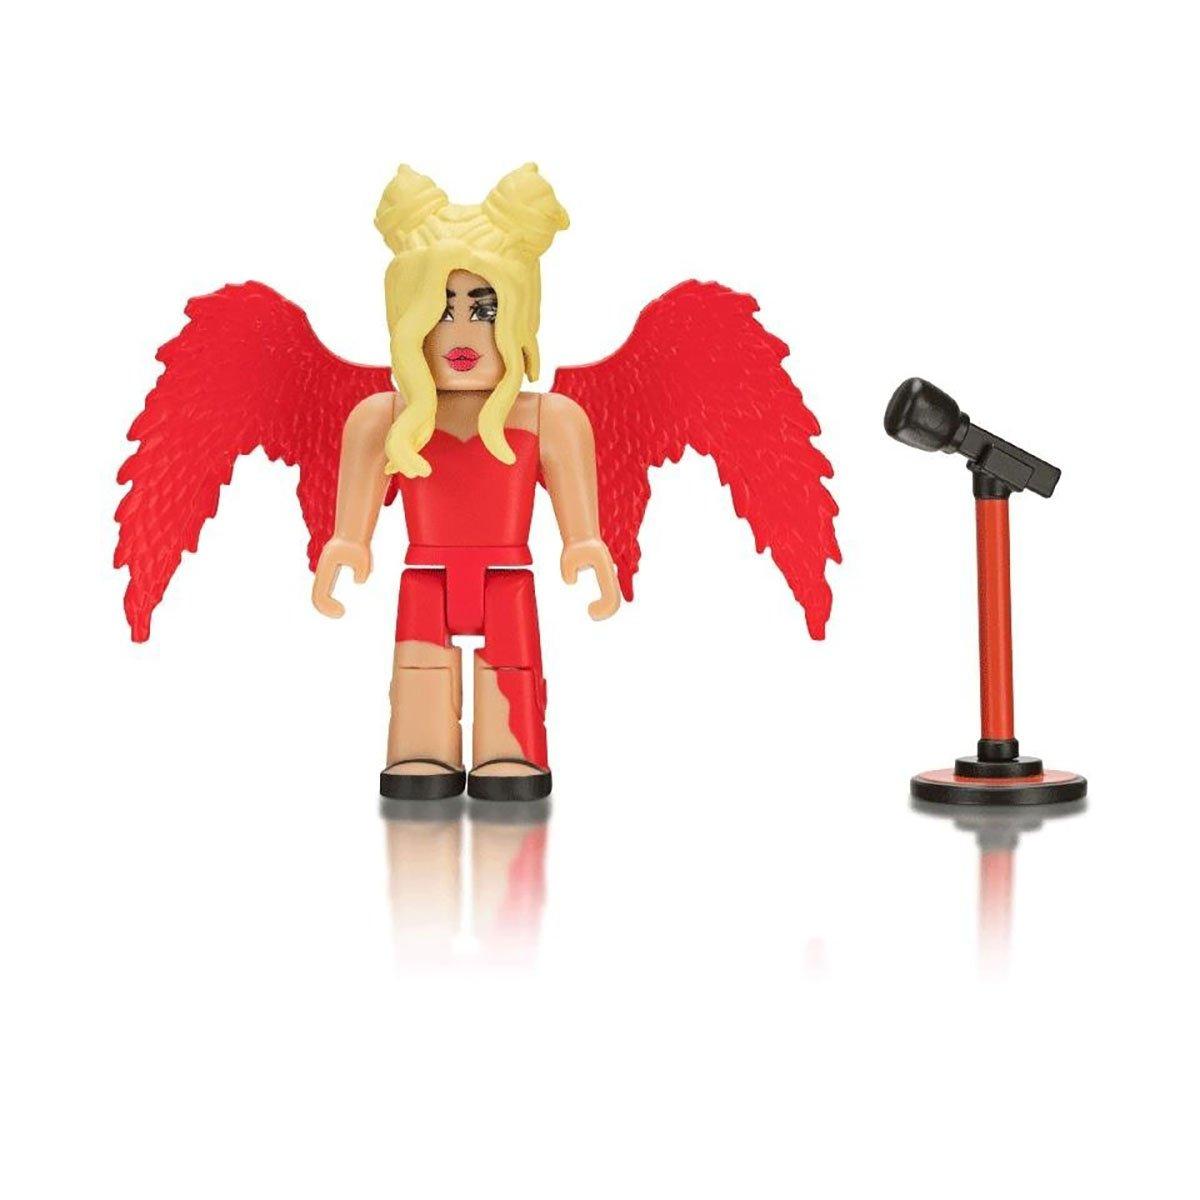 Figurina Roblox - Drama Queen (ROG0112)